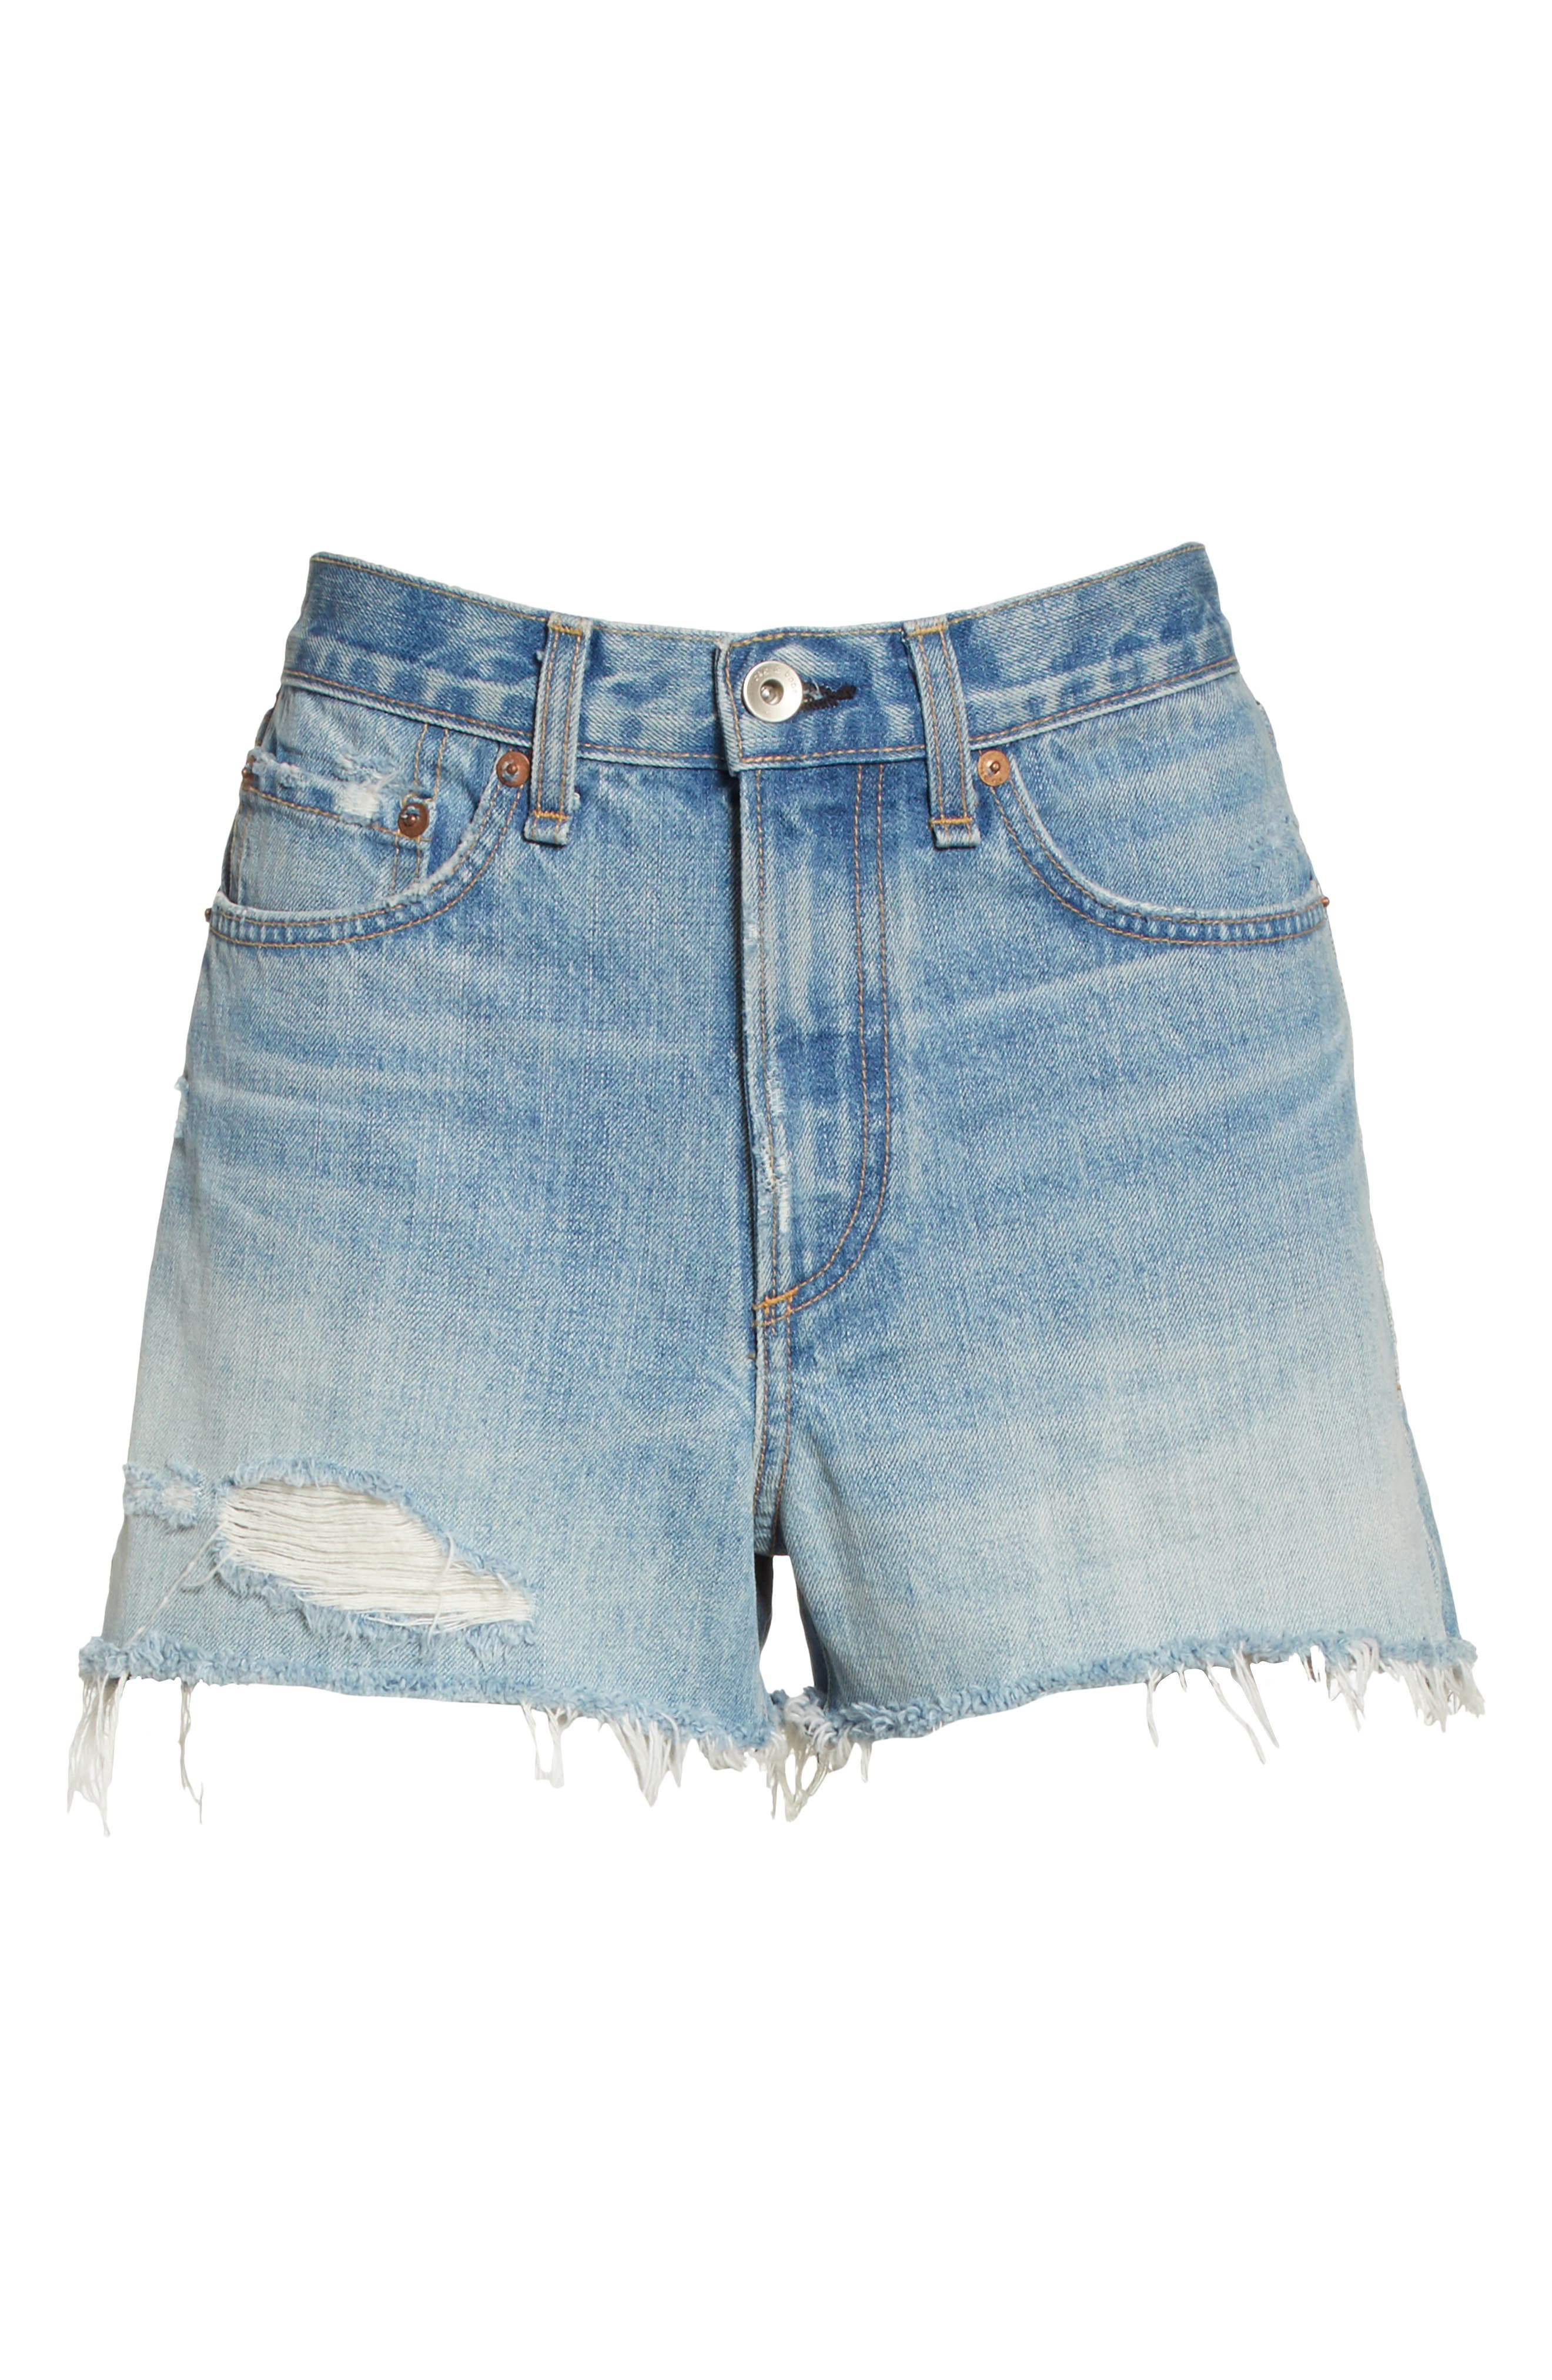 Justine High Waist Cutoff Denim Shorts,                             Alternate thumbnail 6, color,                             450